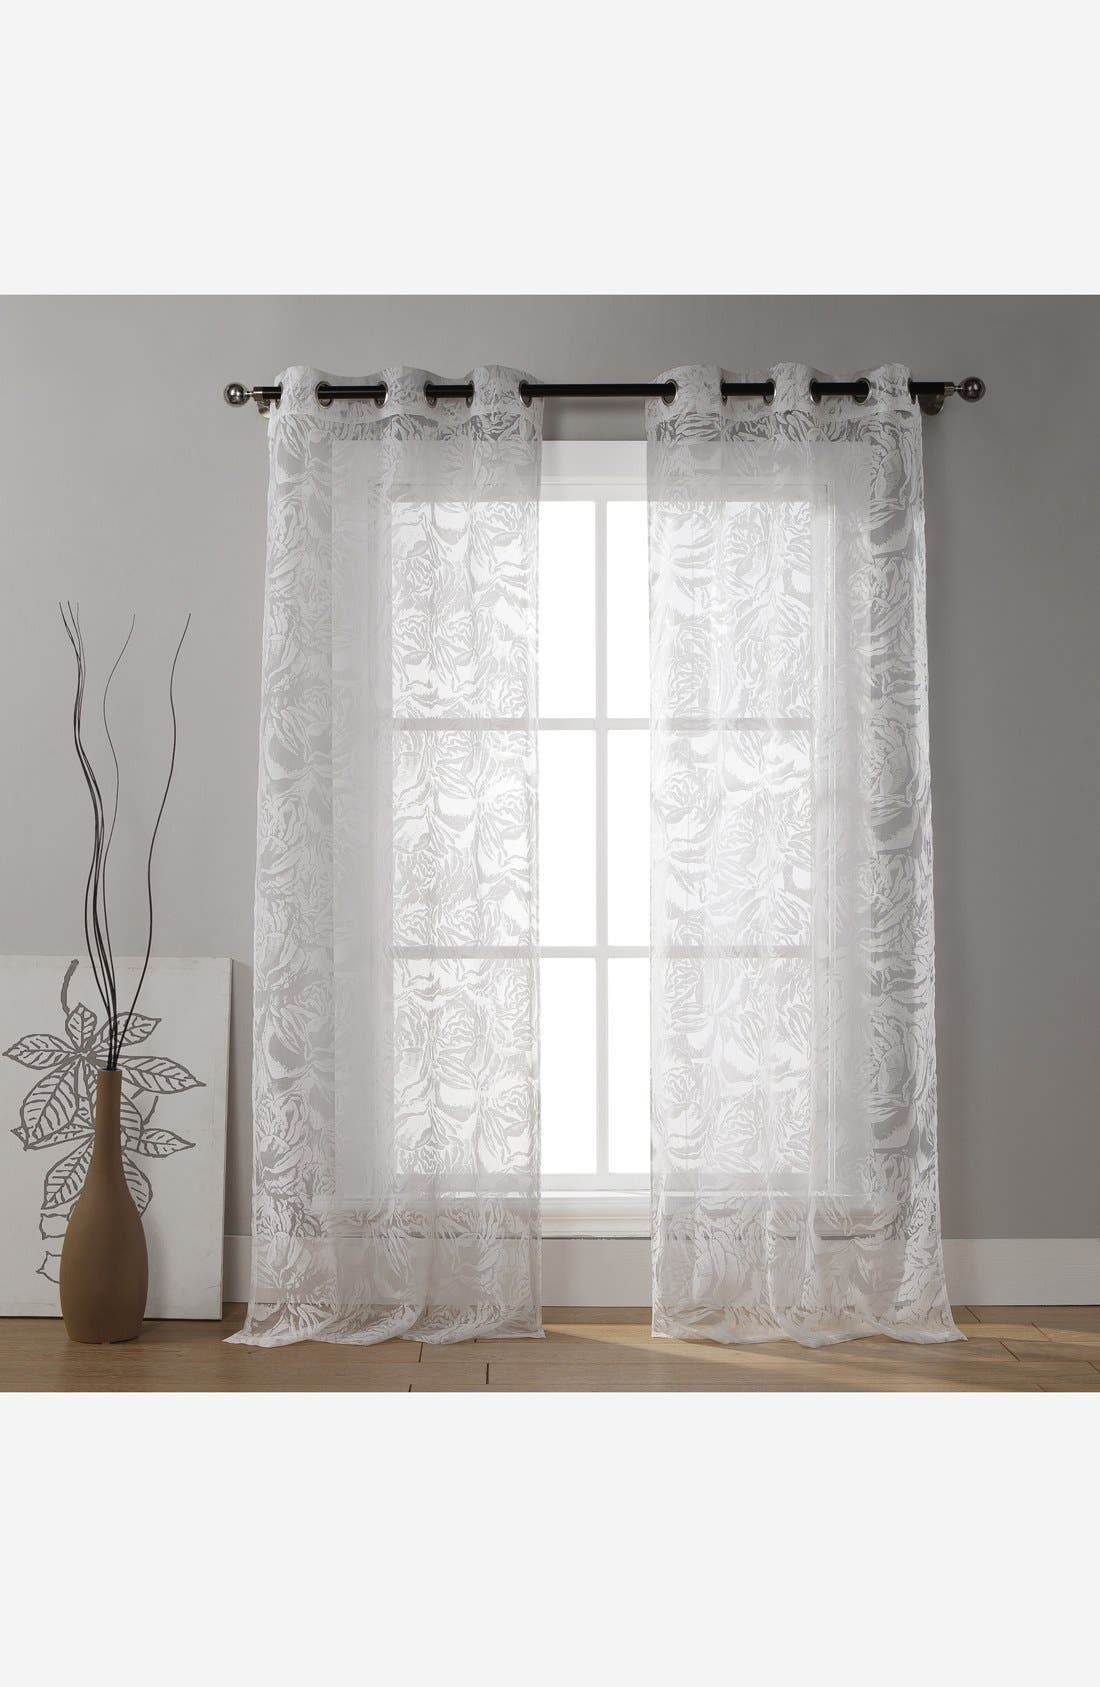 Alternate Image 1 Selected - Duck River Textile 'Raisa' Floral Grommet Window Panels (Set of 2)